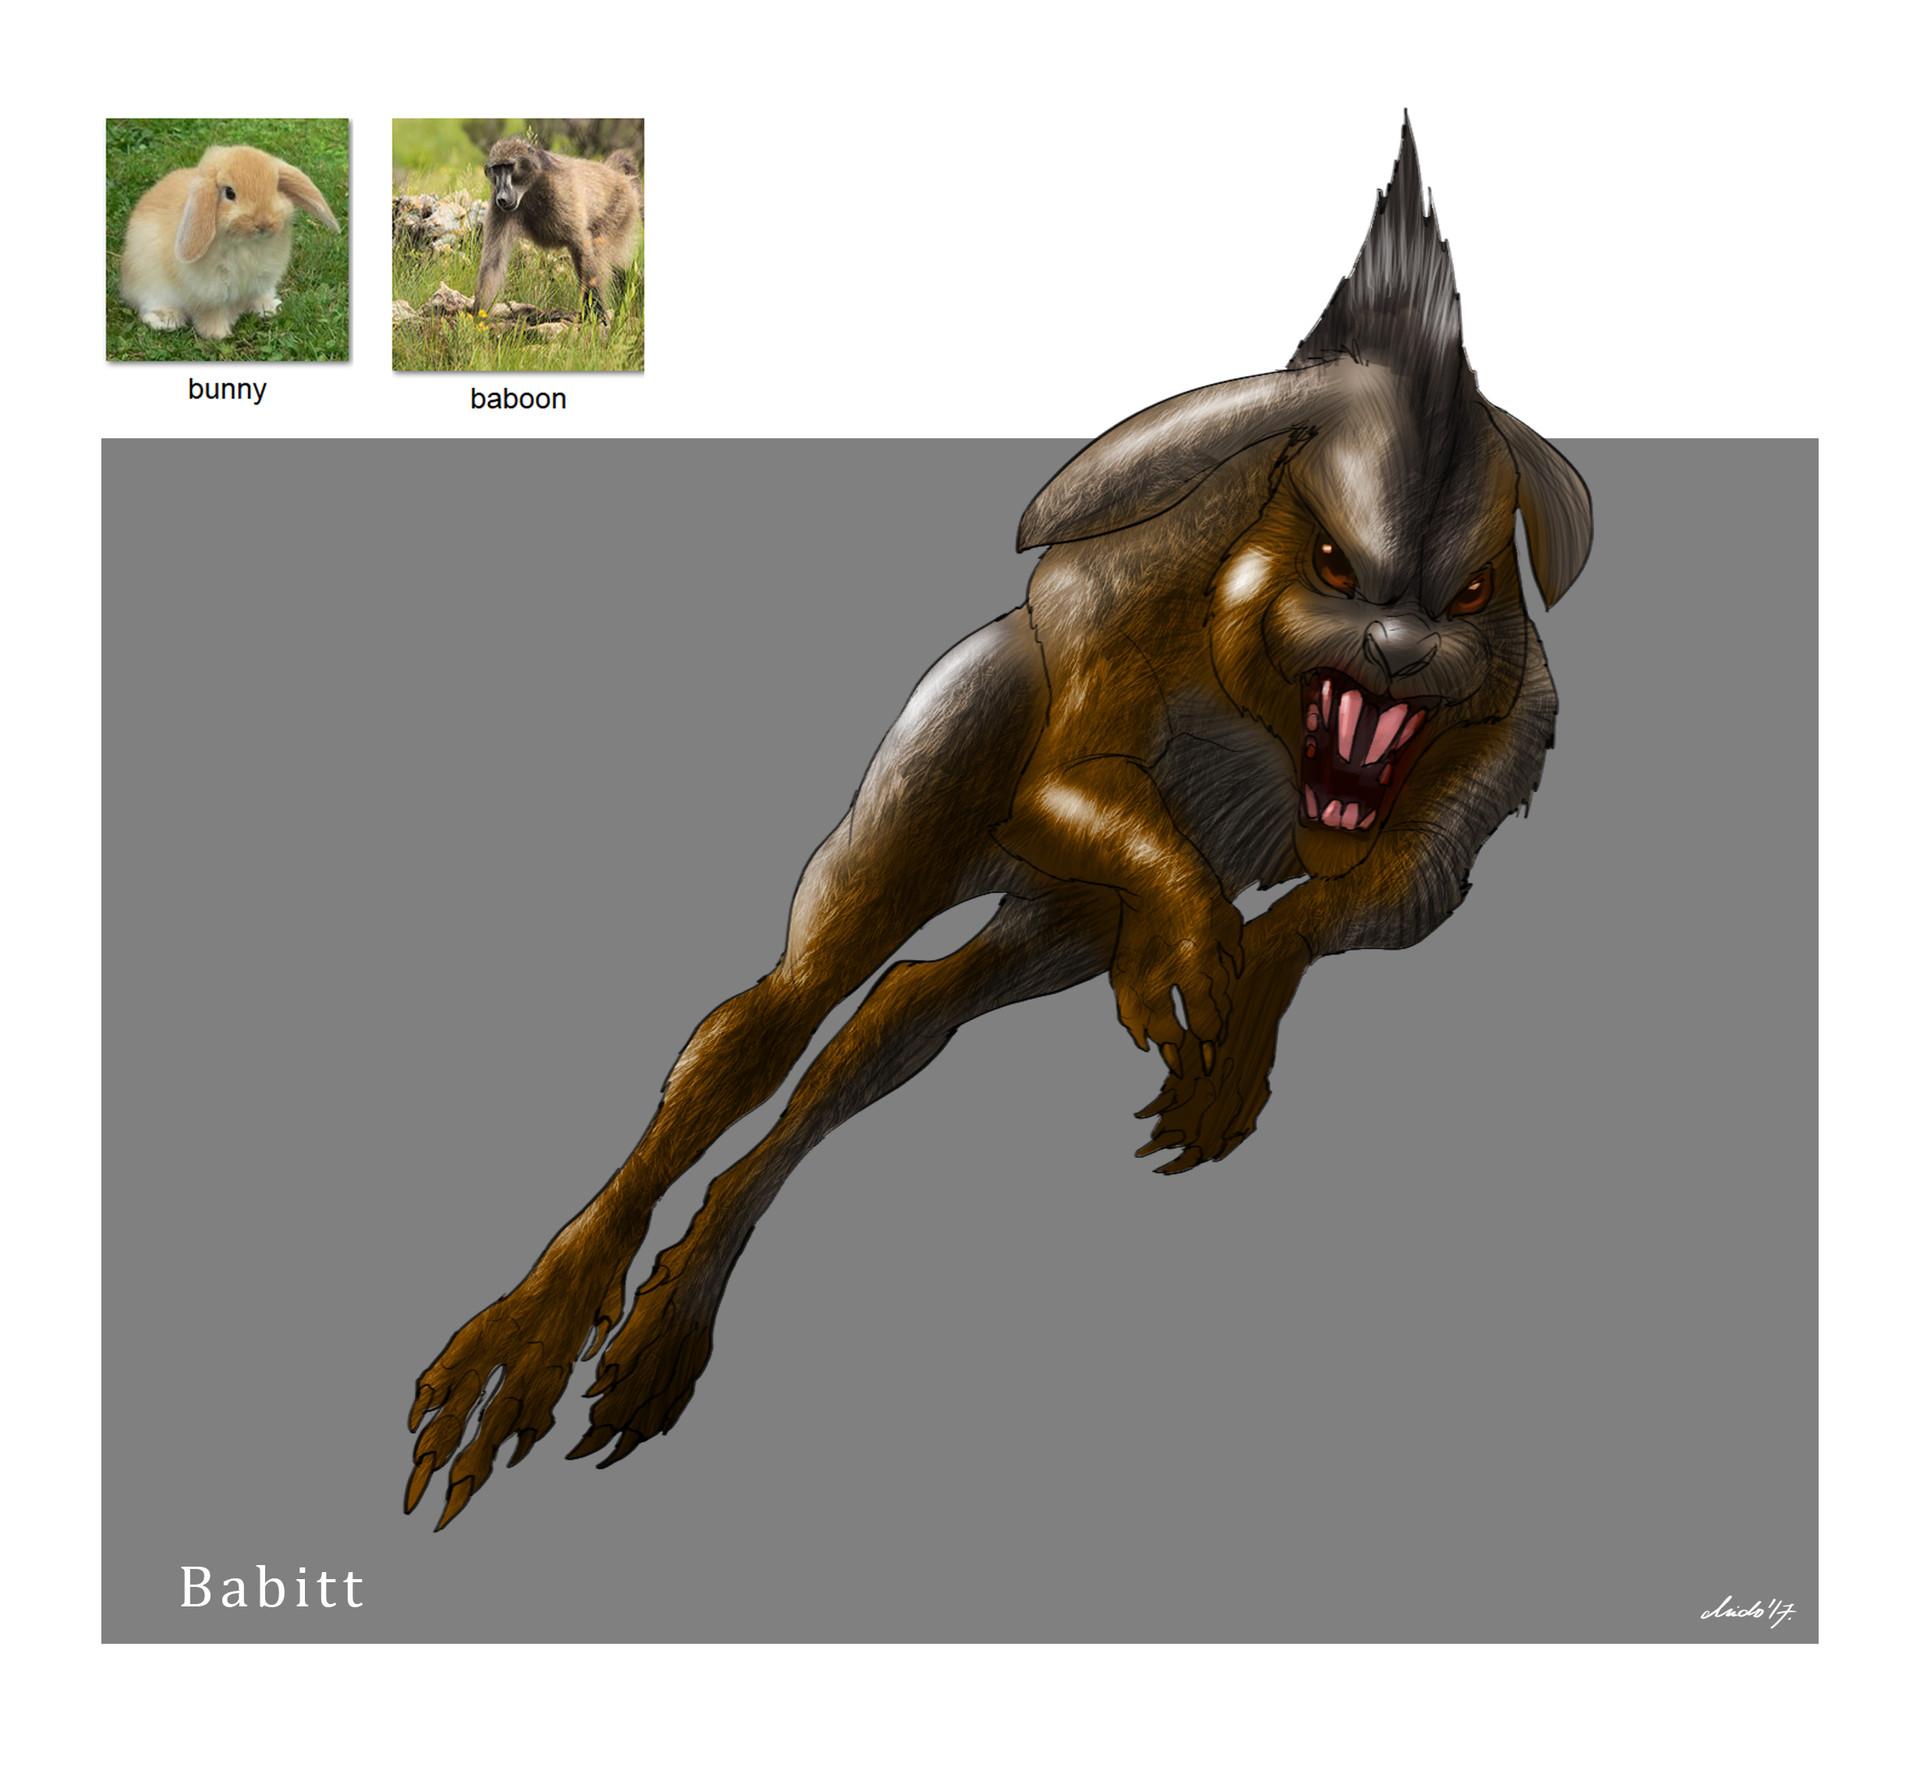 Midhat kapetanovic random creature mashup 011 babitt